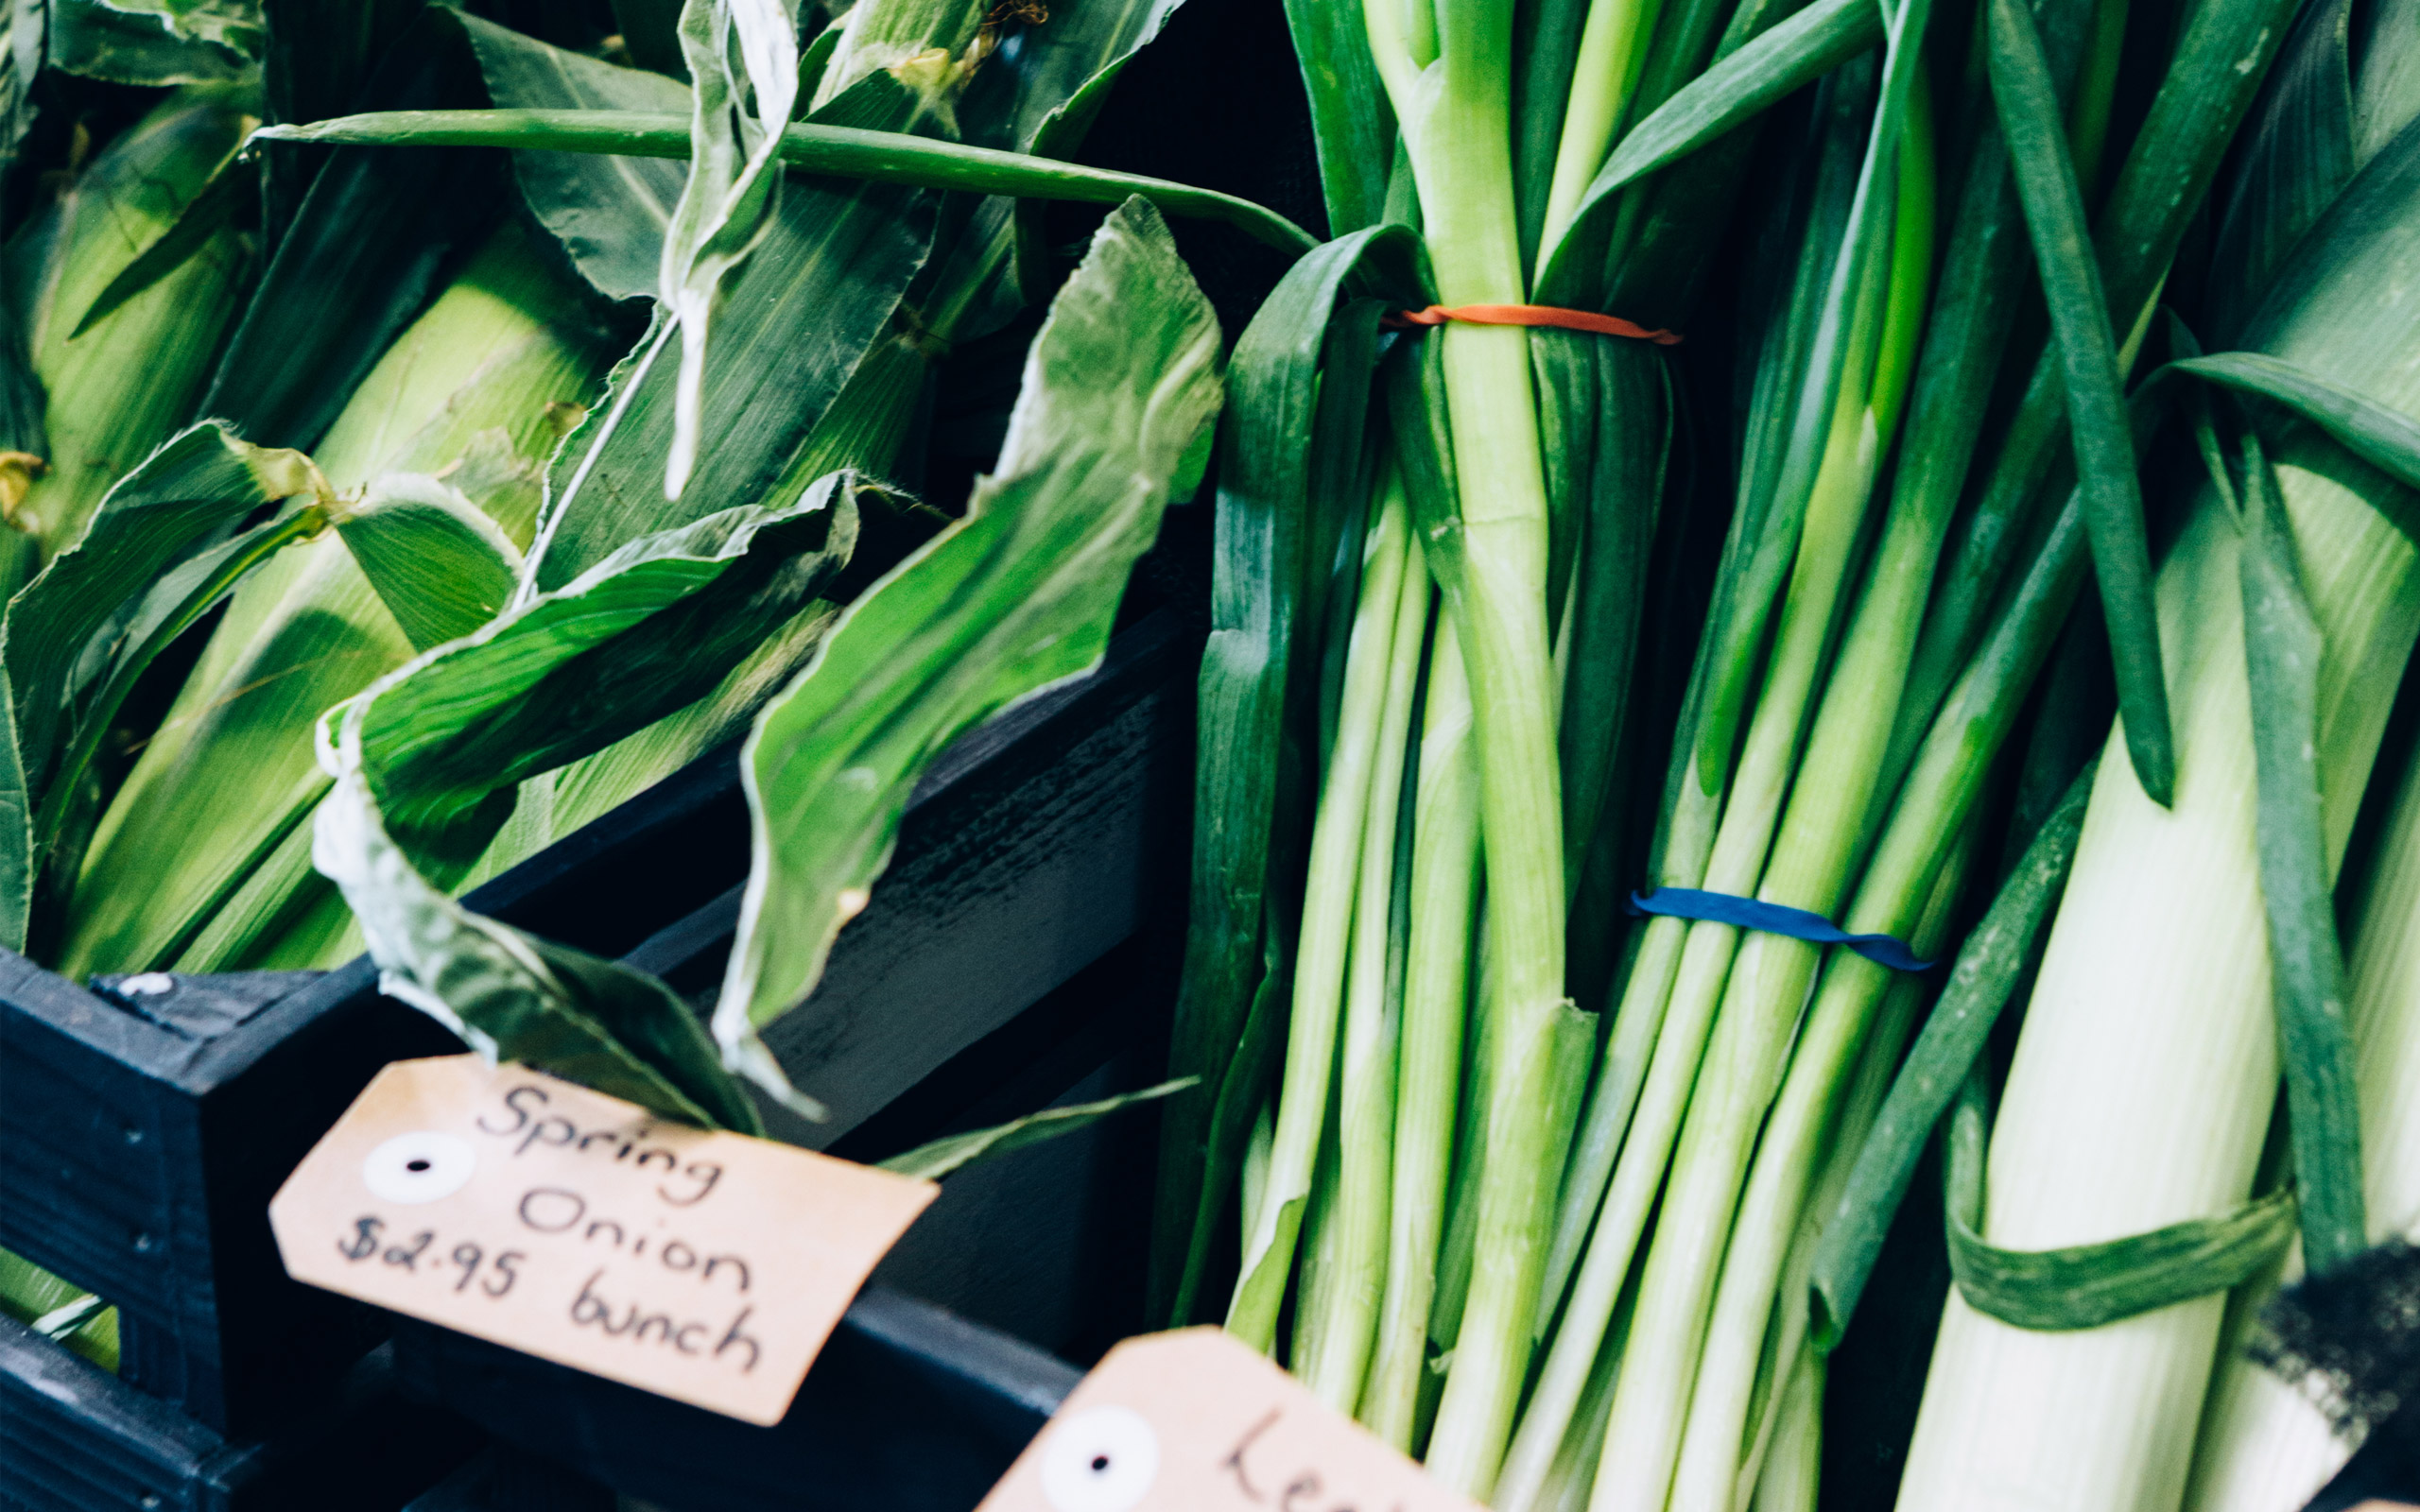 Geelong local green grocer